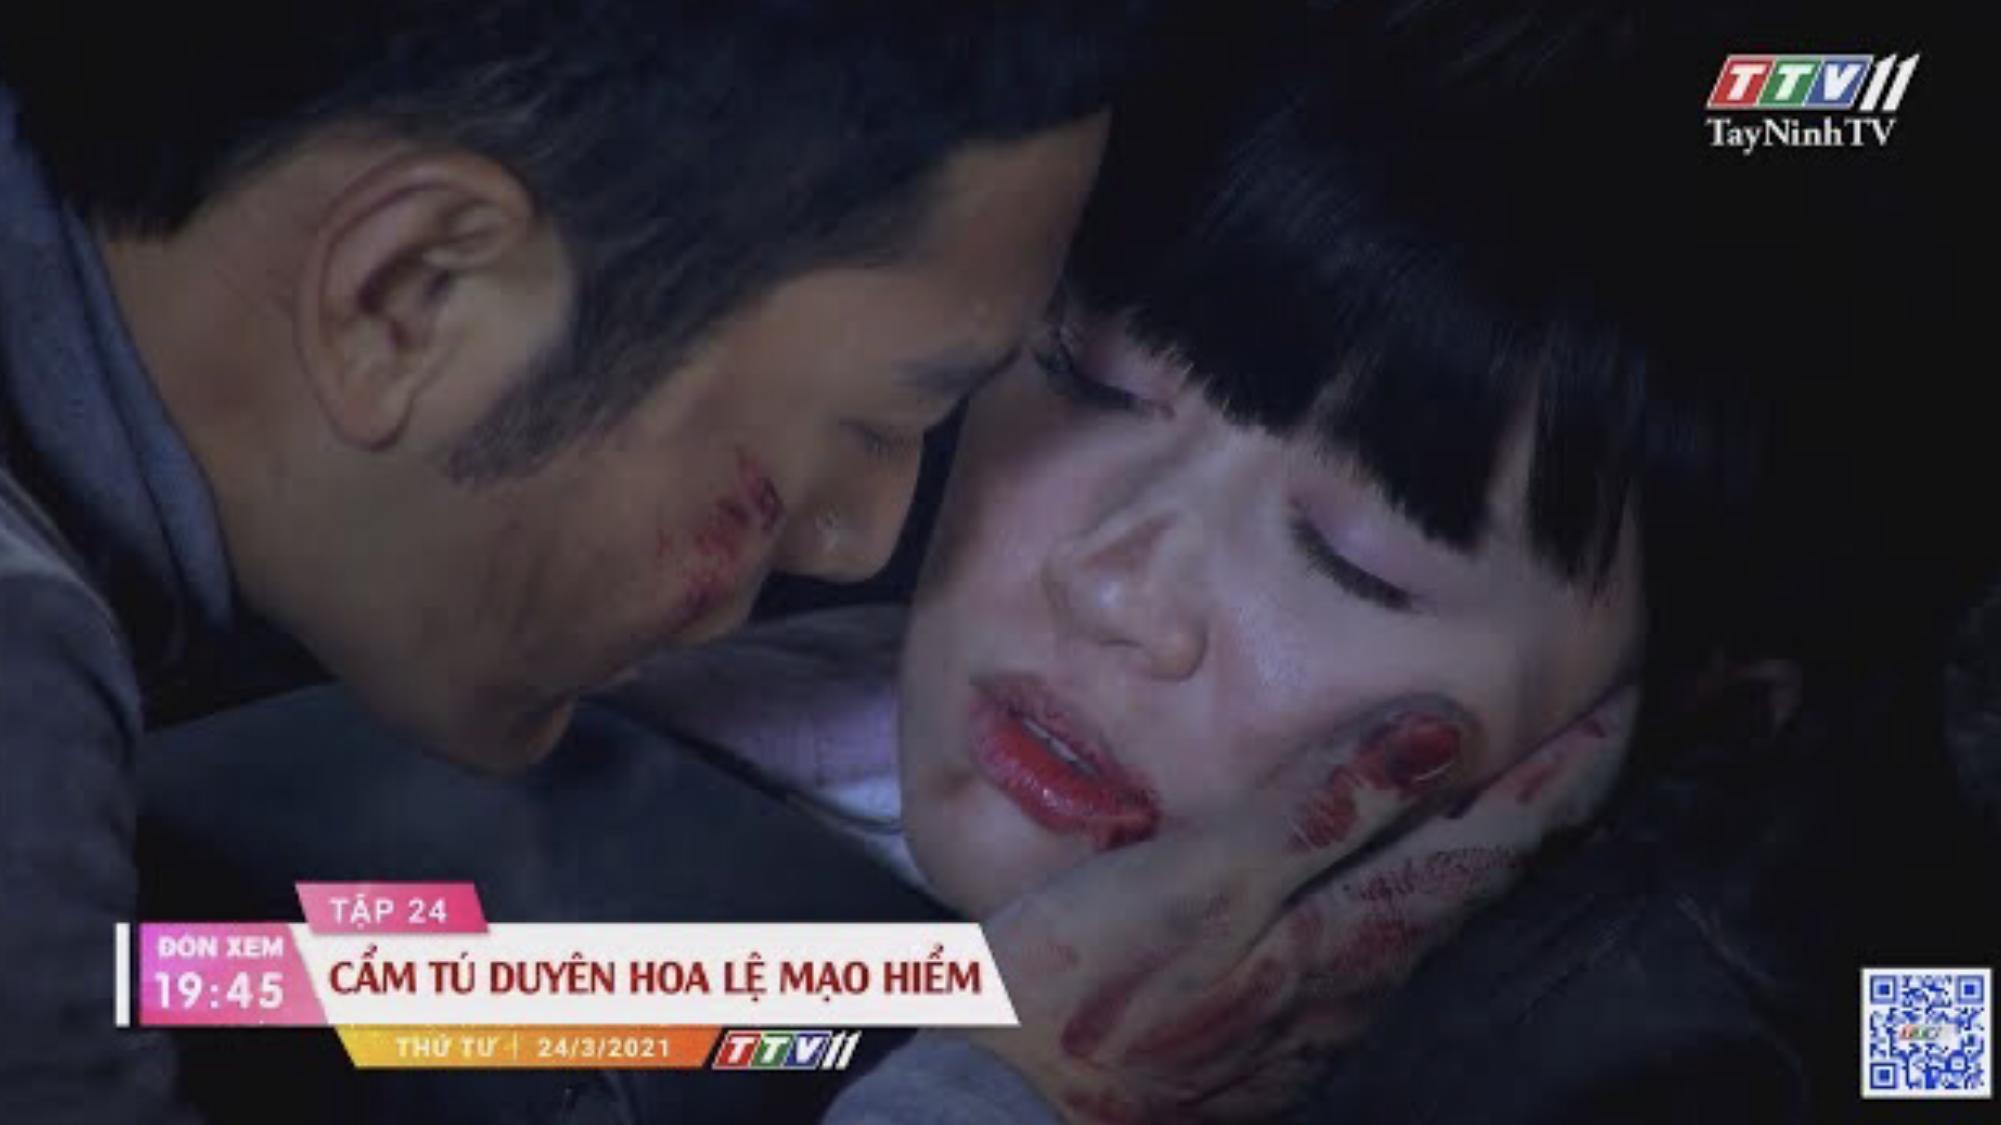 Cẩm Tú duyên hoa lệ mạo hiểm-Trailer tập 24 | PHIM CẨM TÚ DUYÊN HOA LỆ MẠO HIỂM | TayNinhTVE